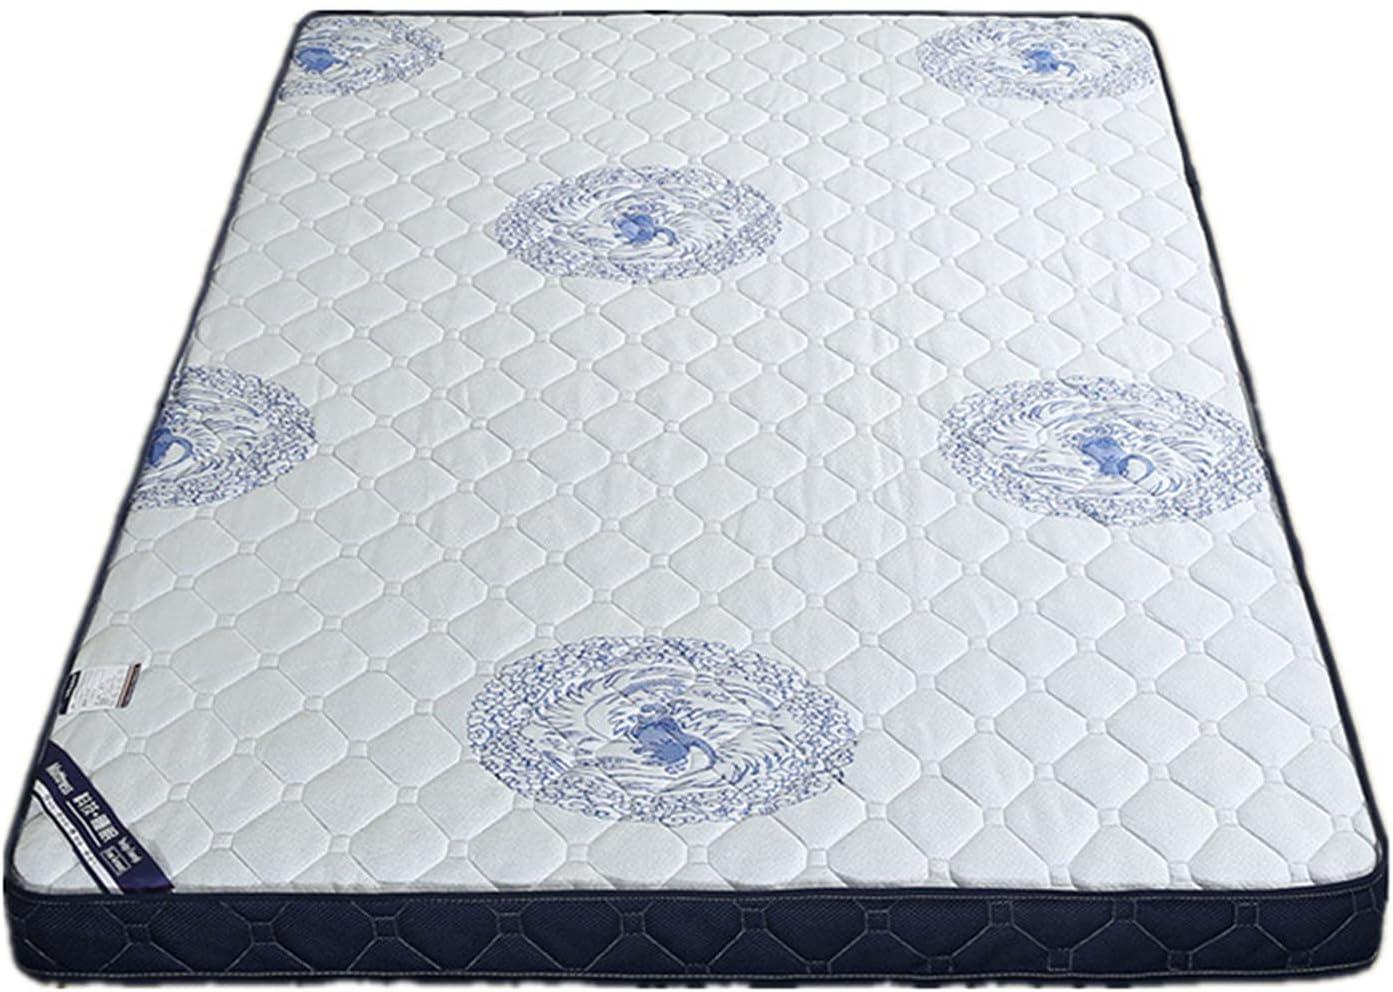 CNAJOI-TDFY Bedding Natural Latex Hybrid Mattress Large discharge sale Full Price reduction Gel Memo